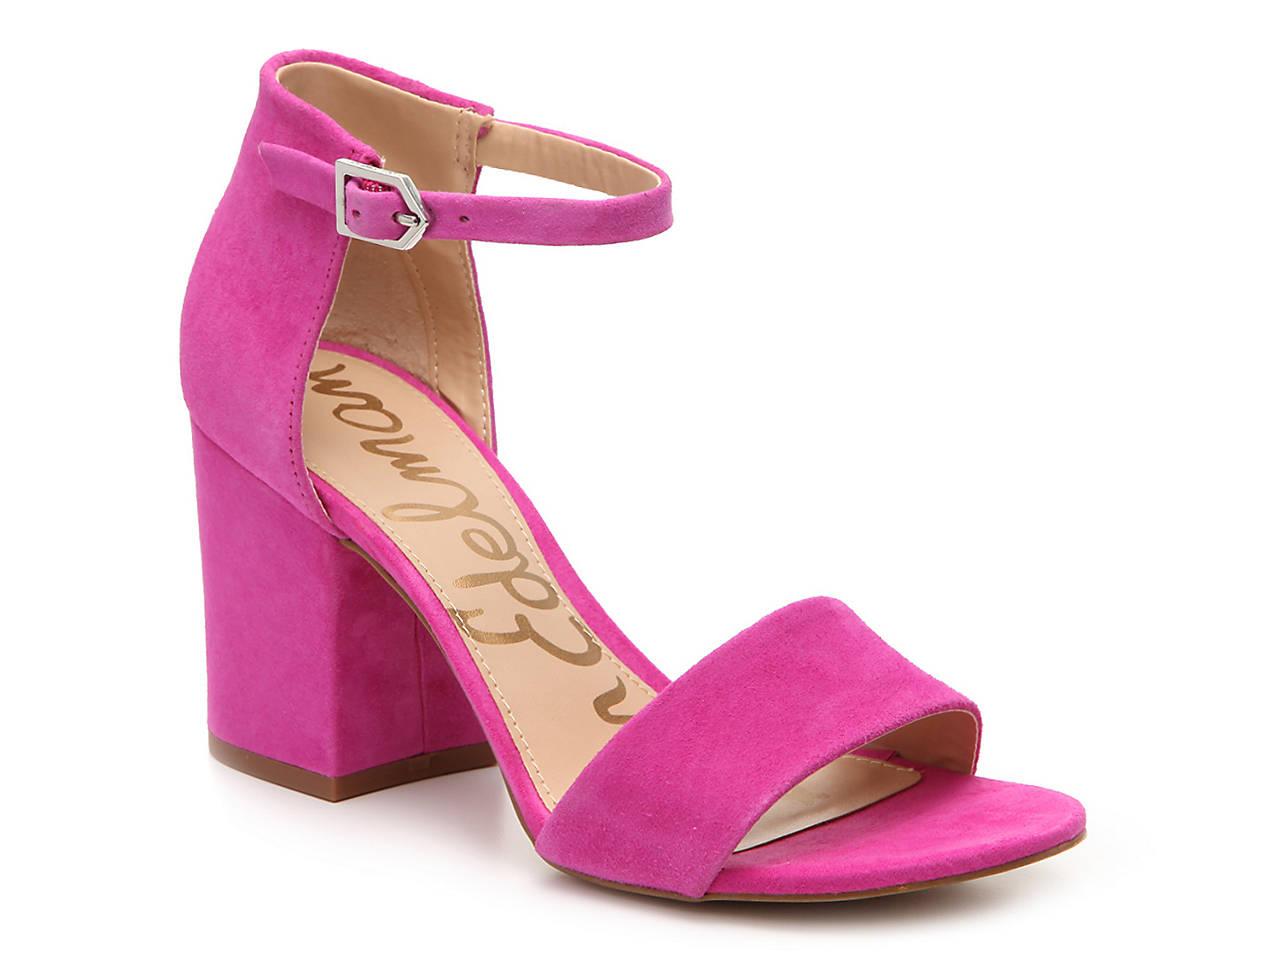 647c2b788c91 Sam Edelman Torrence Sandal Women s Shoes